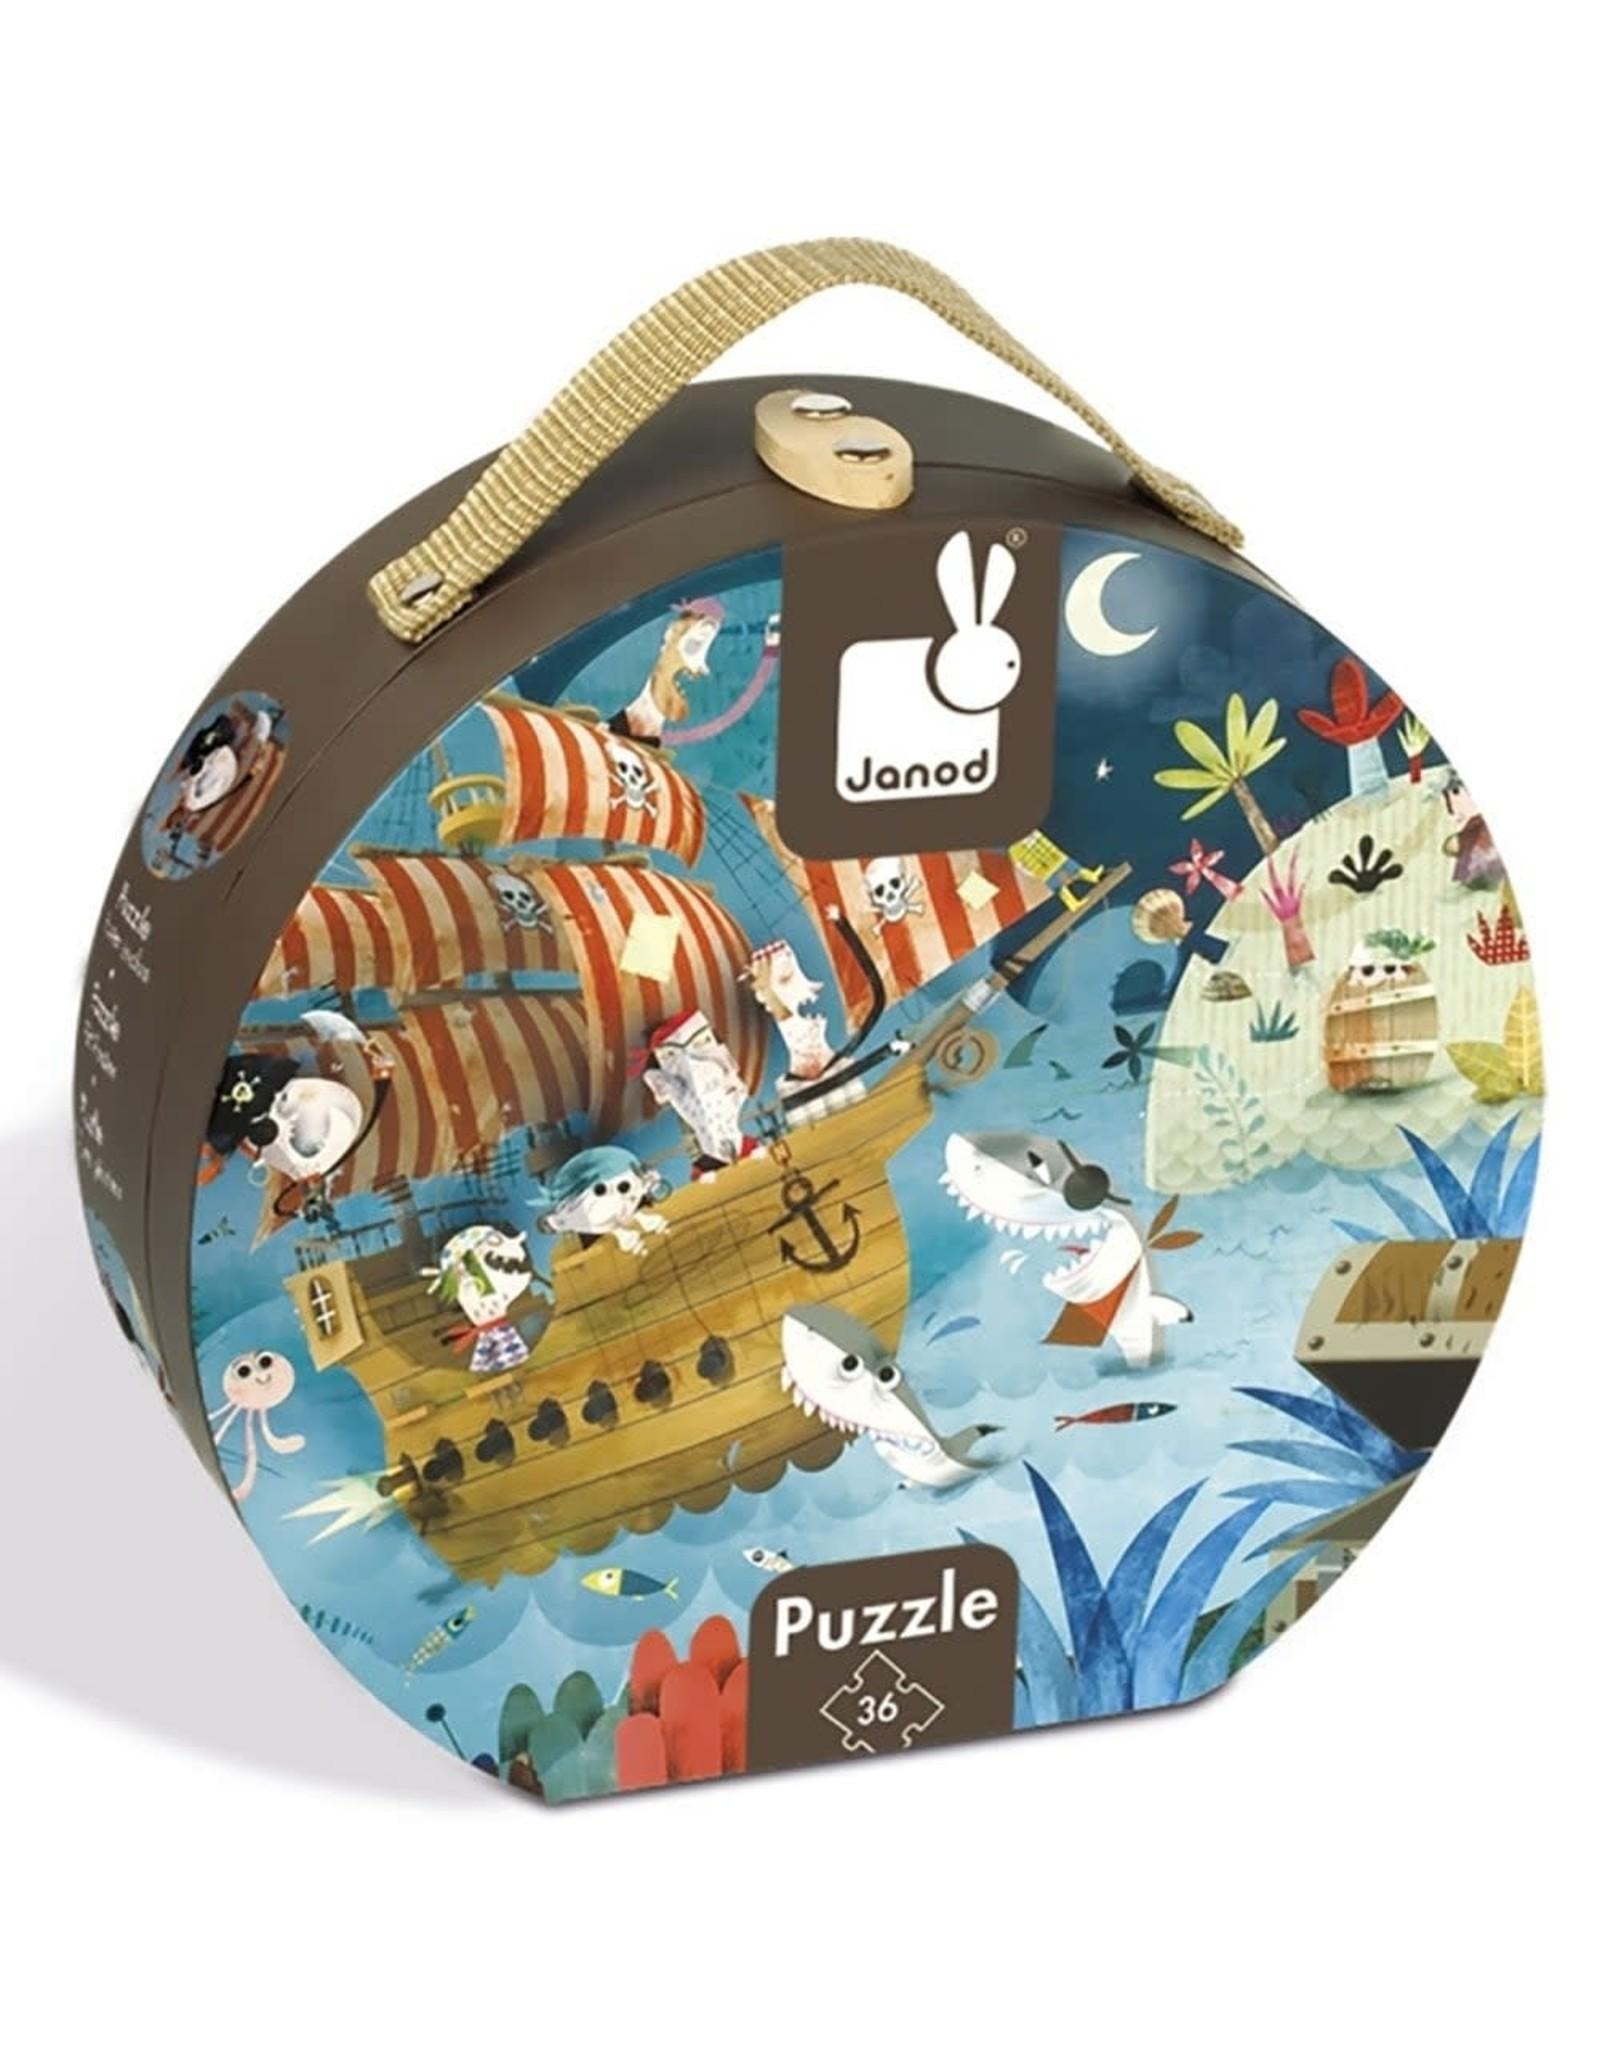 Hat Box Puzzle: Treasure Hunt